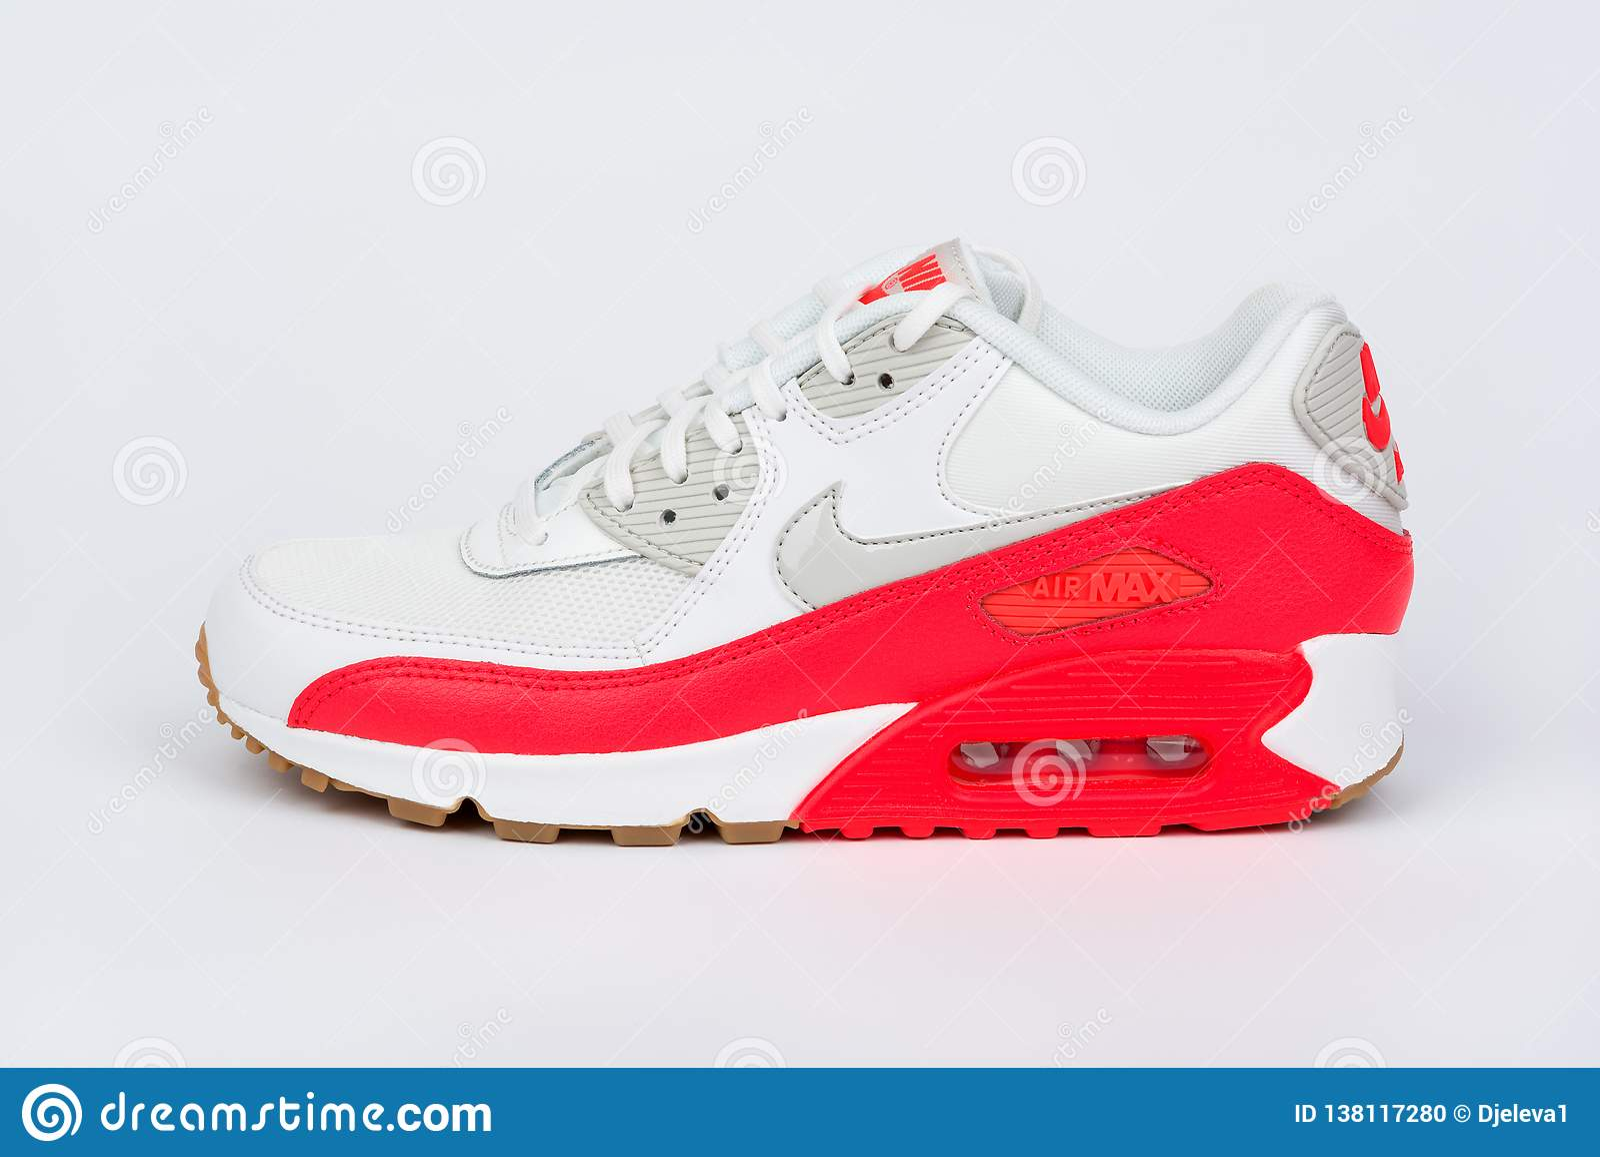 nike air max schoenen 2016